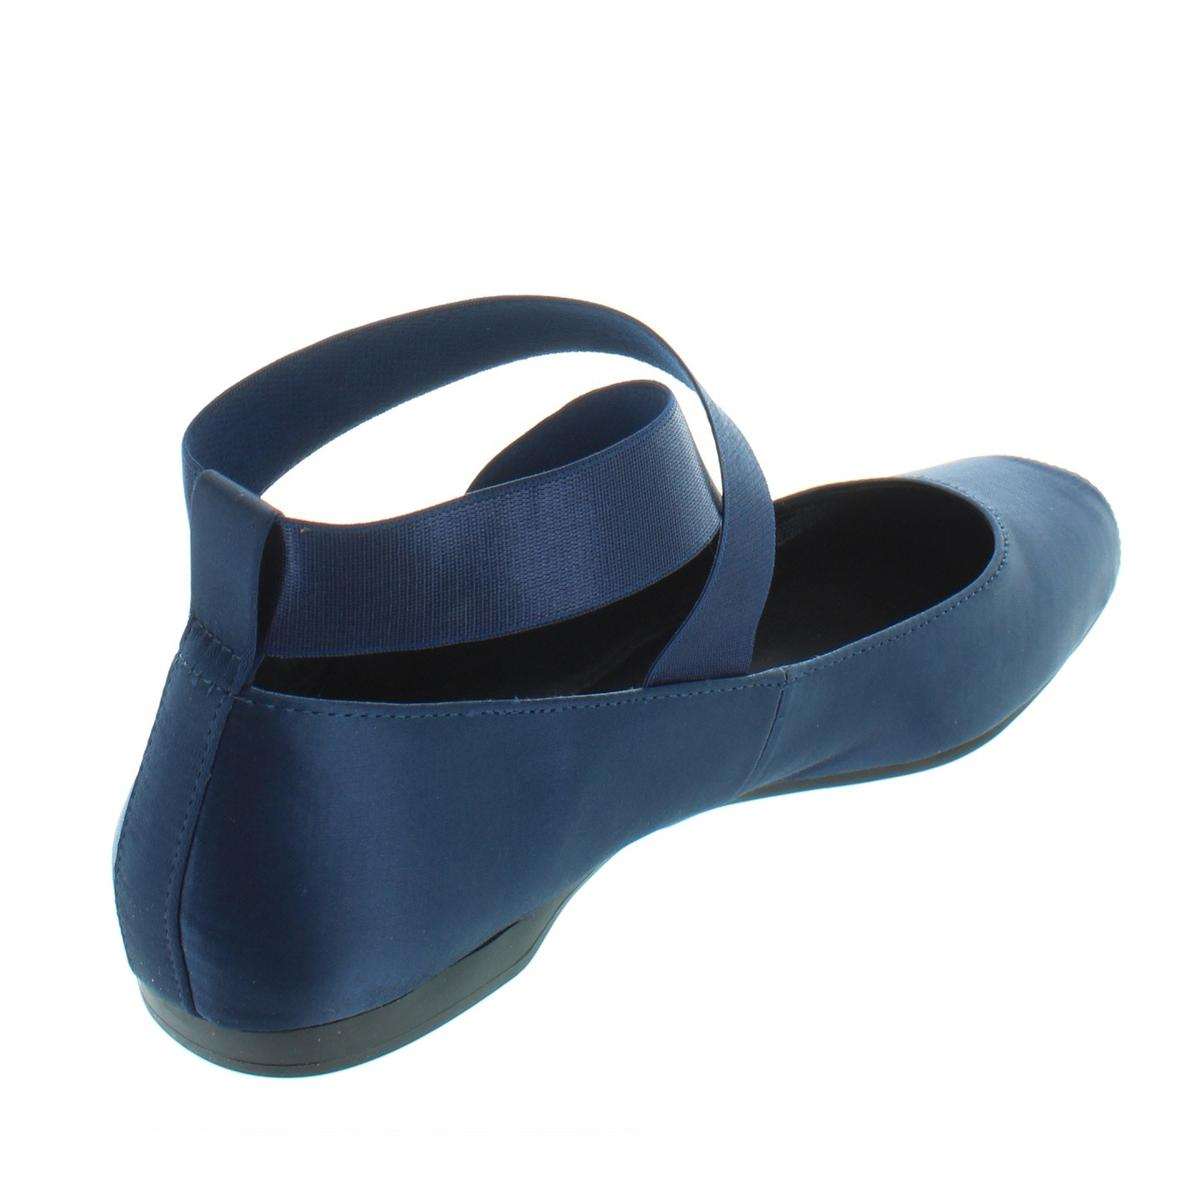 Jessica-Simpson-Women-039-s-Mandalaye-Square-Toe-Ankle-Wrap-Ballet-Flats thumbnail 12